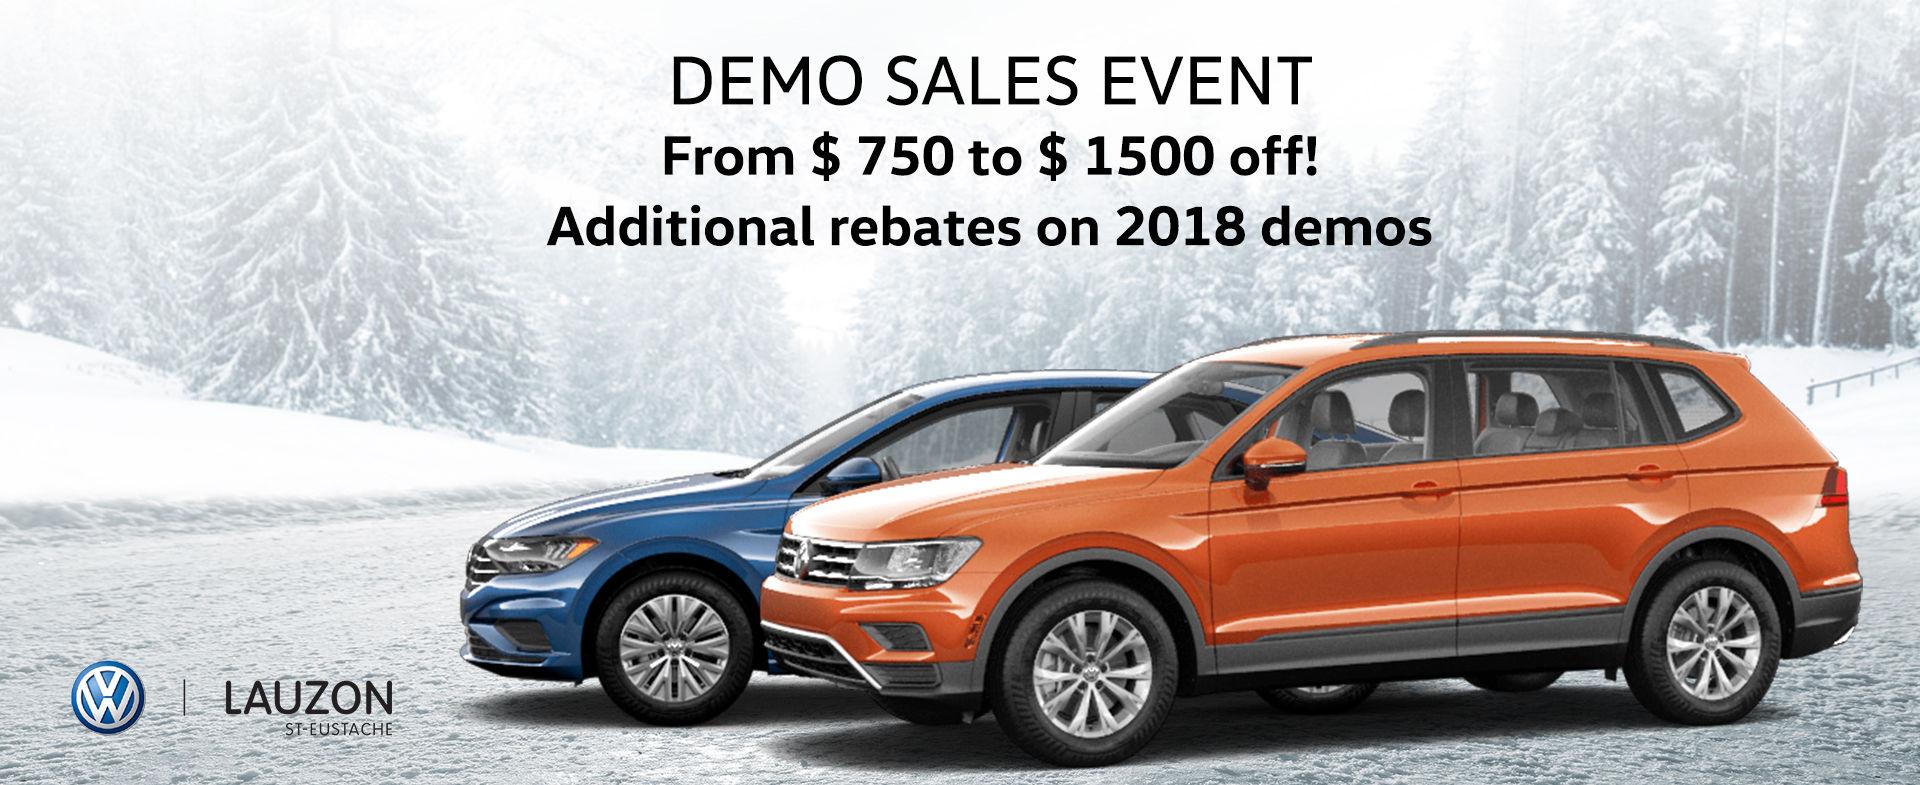 VW Demo Event